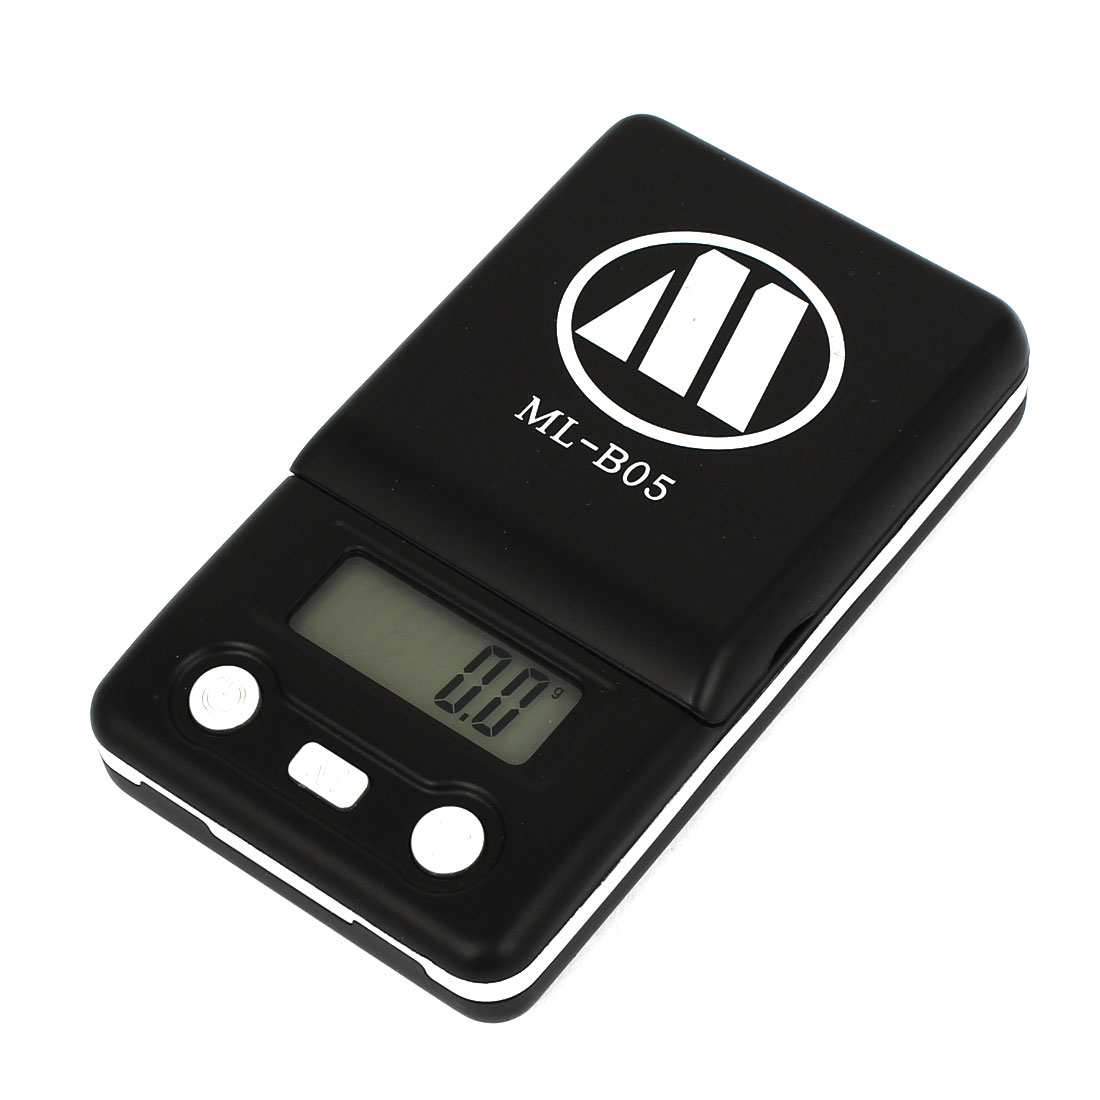 Handy 500g x 0.1g Jewelry Weight Balance Digital Pocket Scale